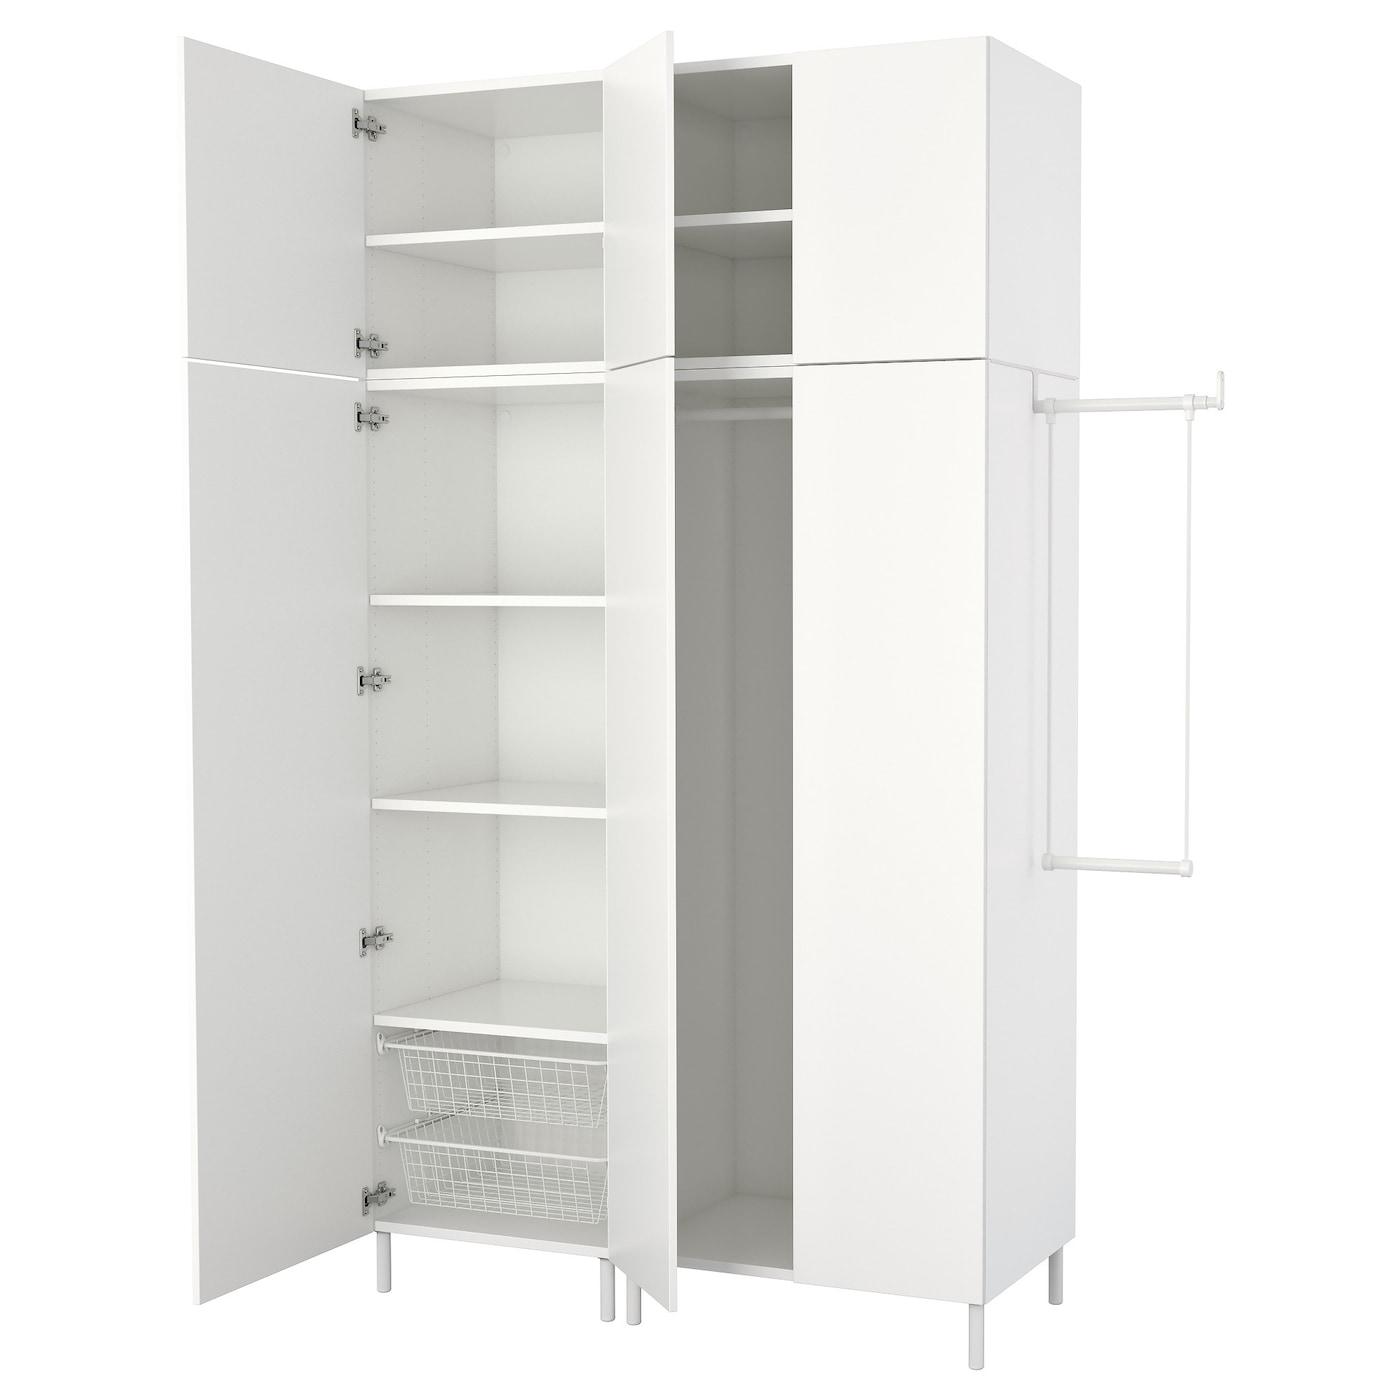 platsa wardrobe white fonnes white 175 200 x 57 x 251 cm ikea. Black Bedroom Furniture Sets. Home Design Ideas